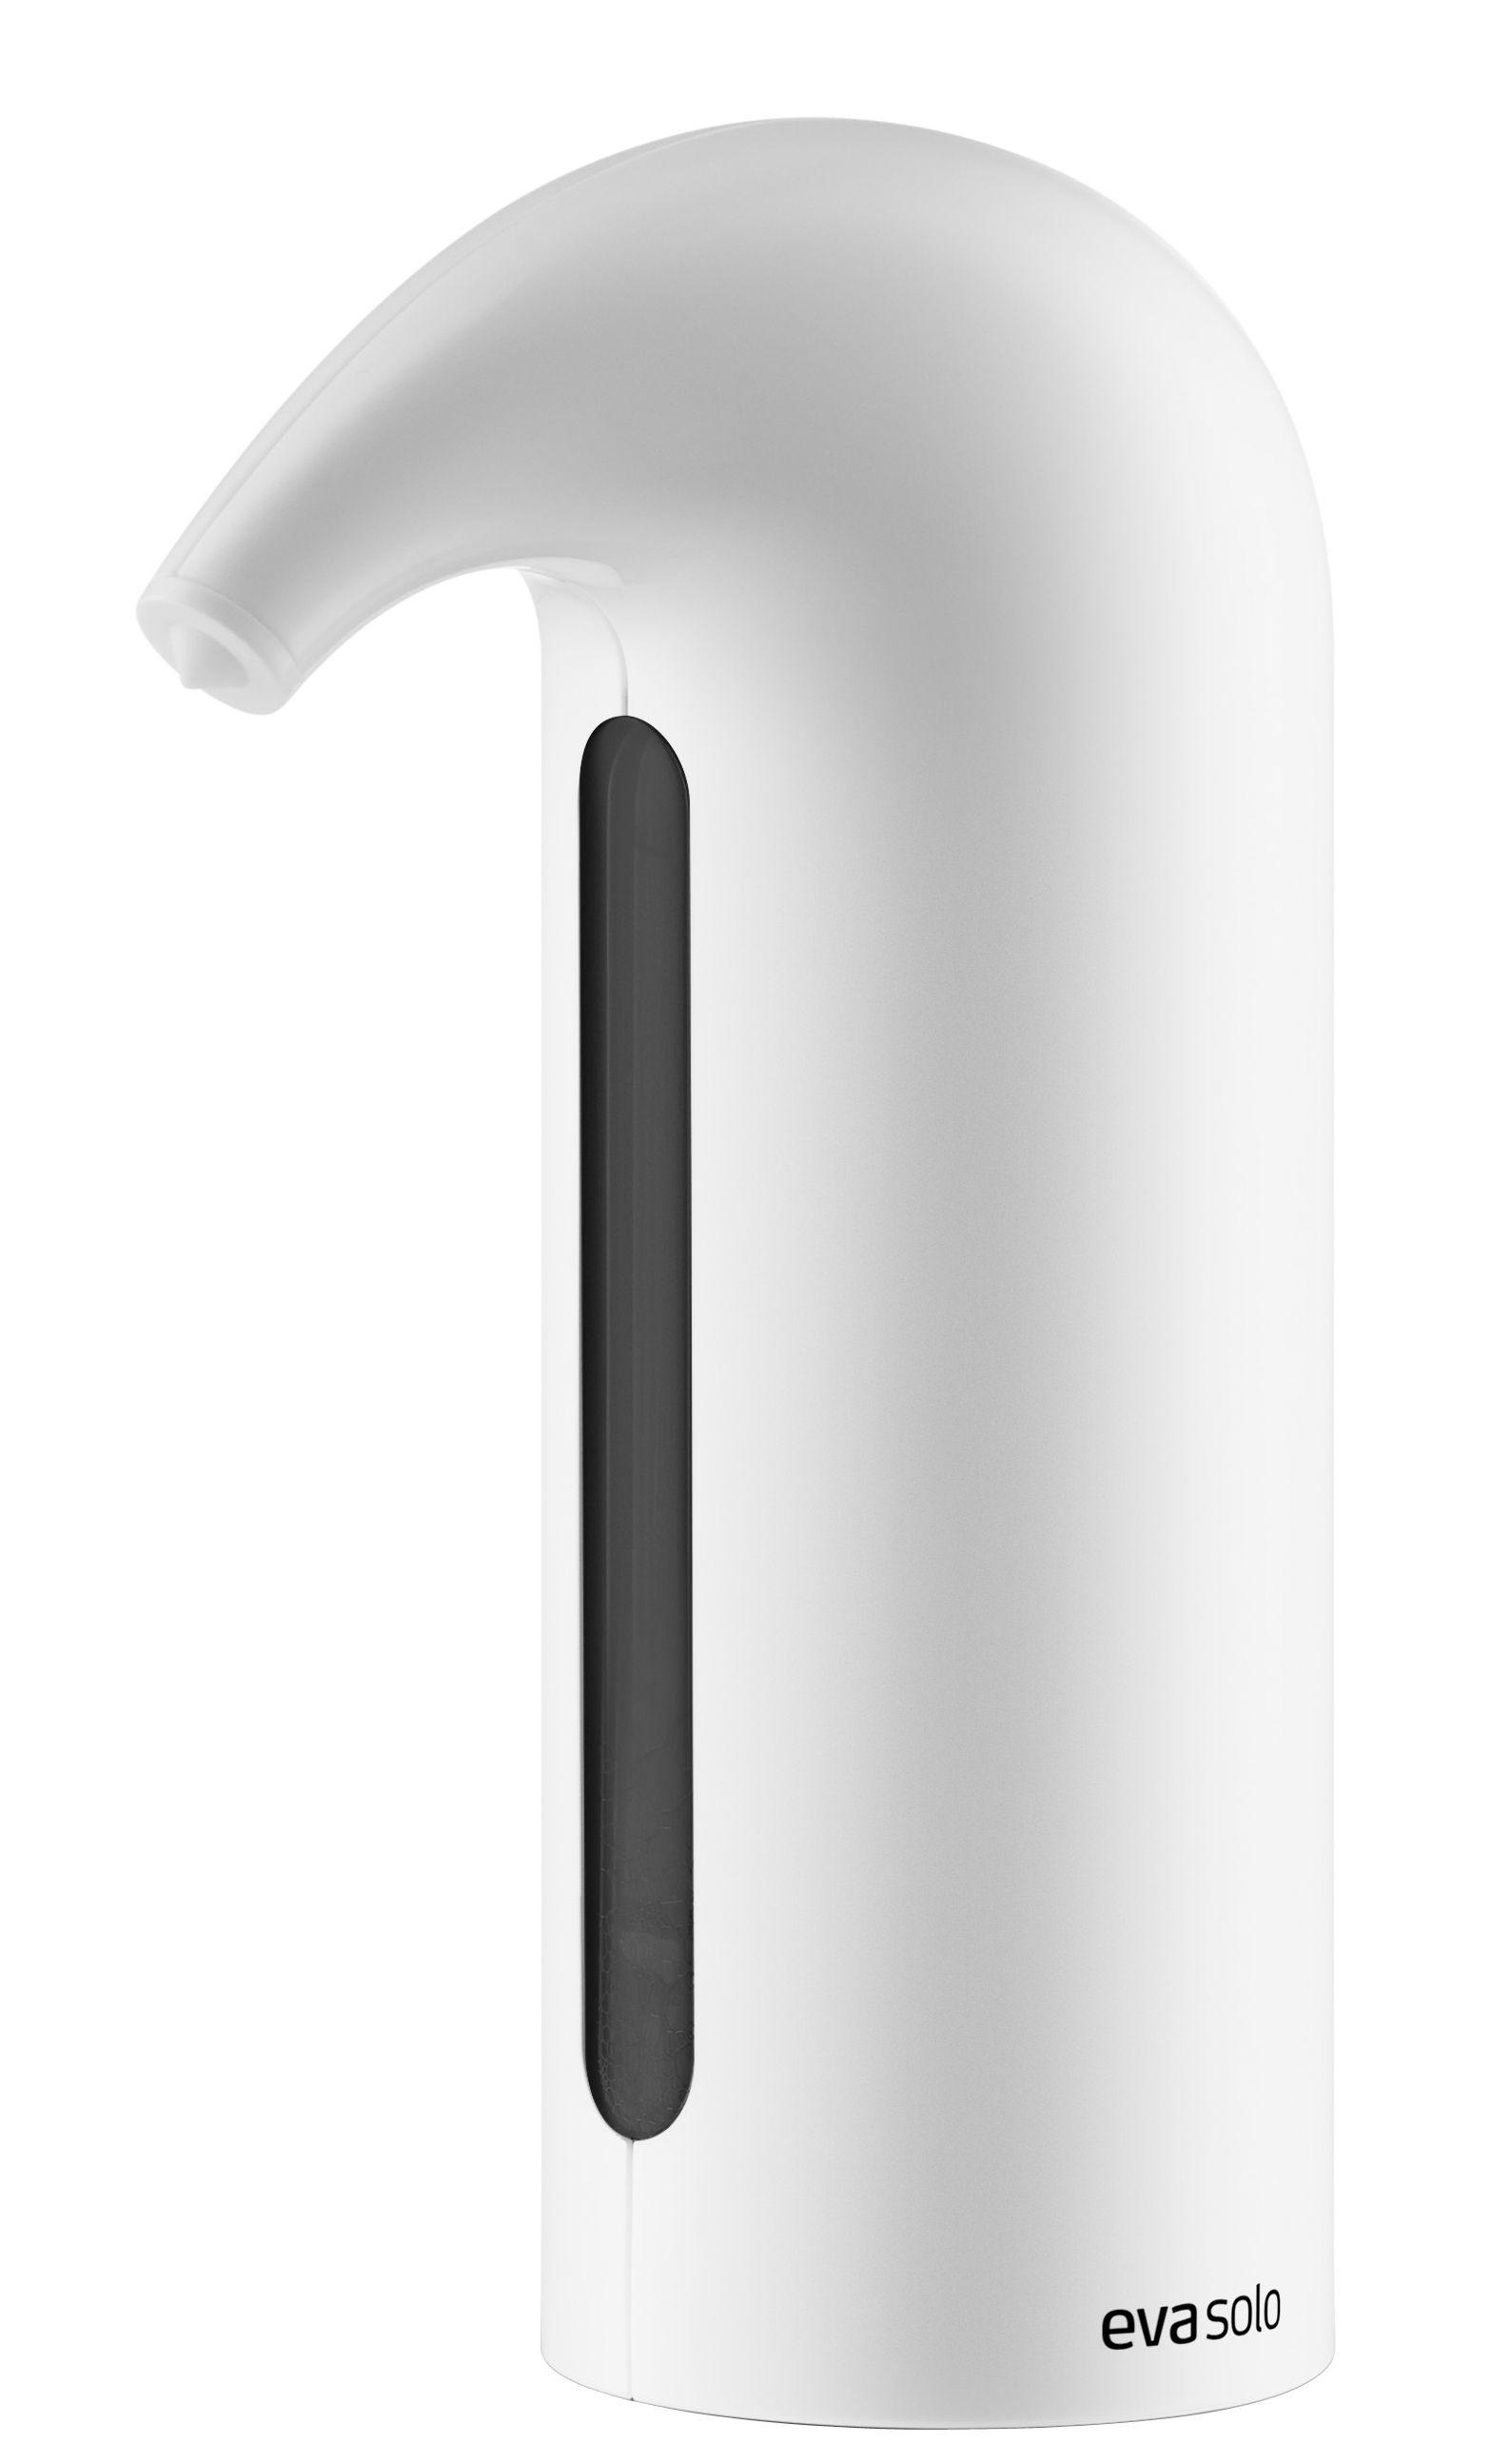 soap dispenser by eva solo white h 20 x  u00d8 6 made in